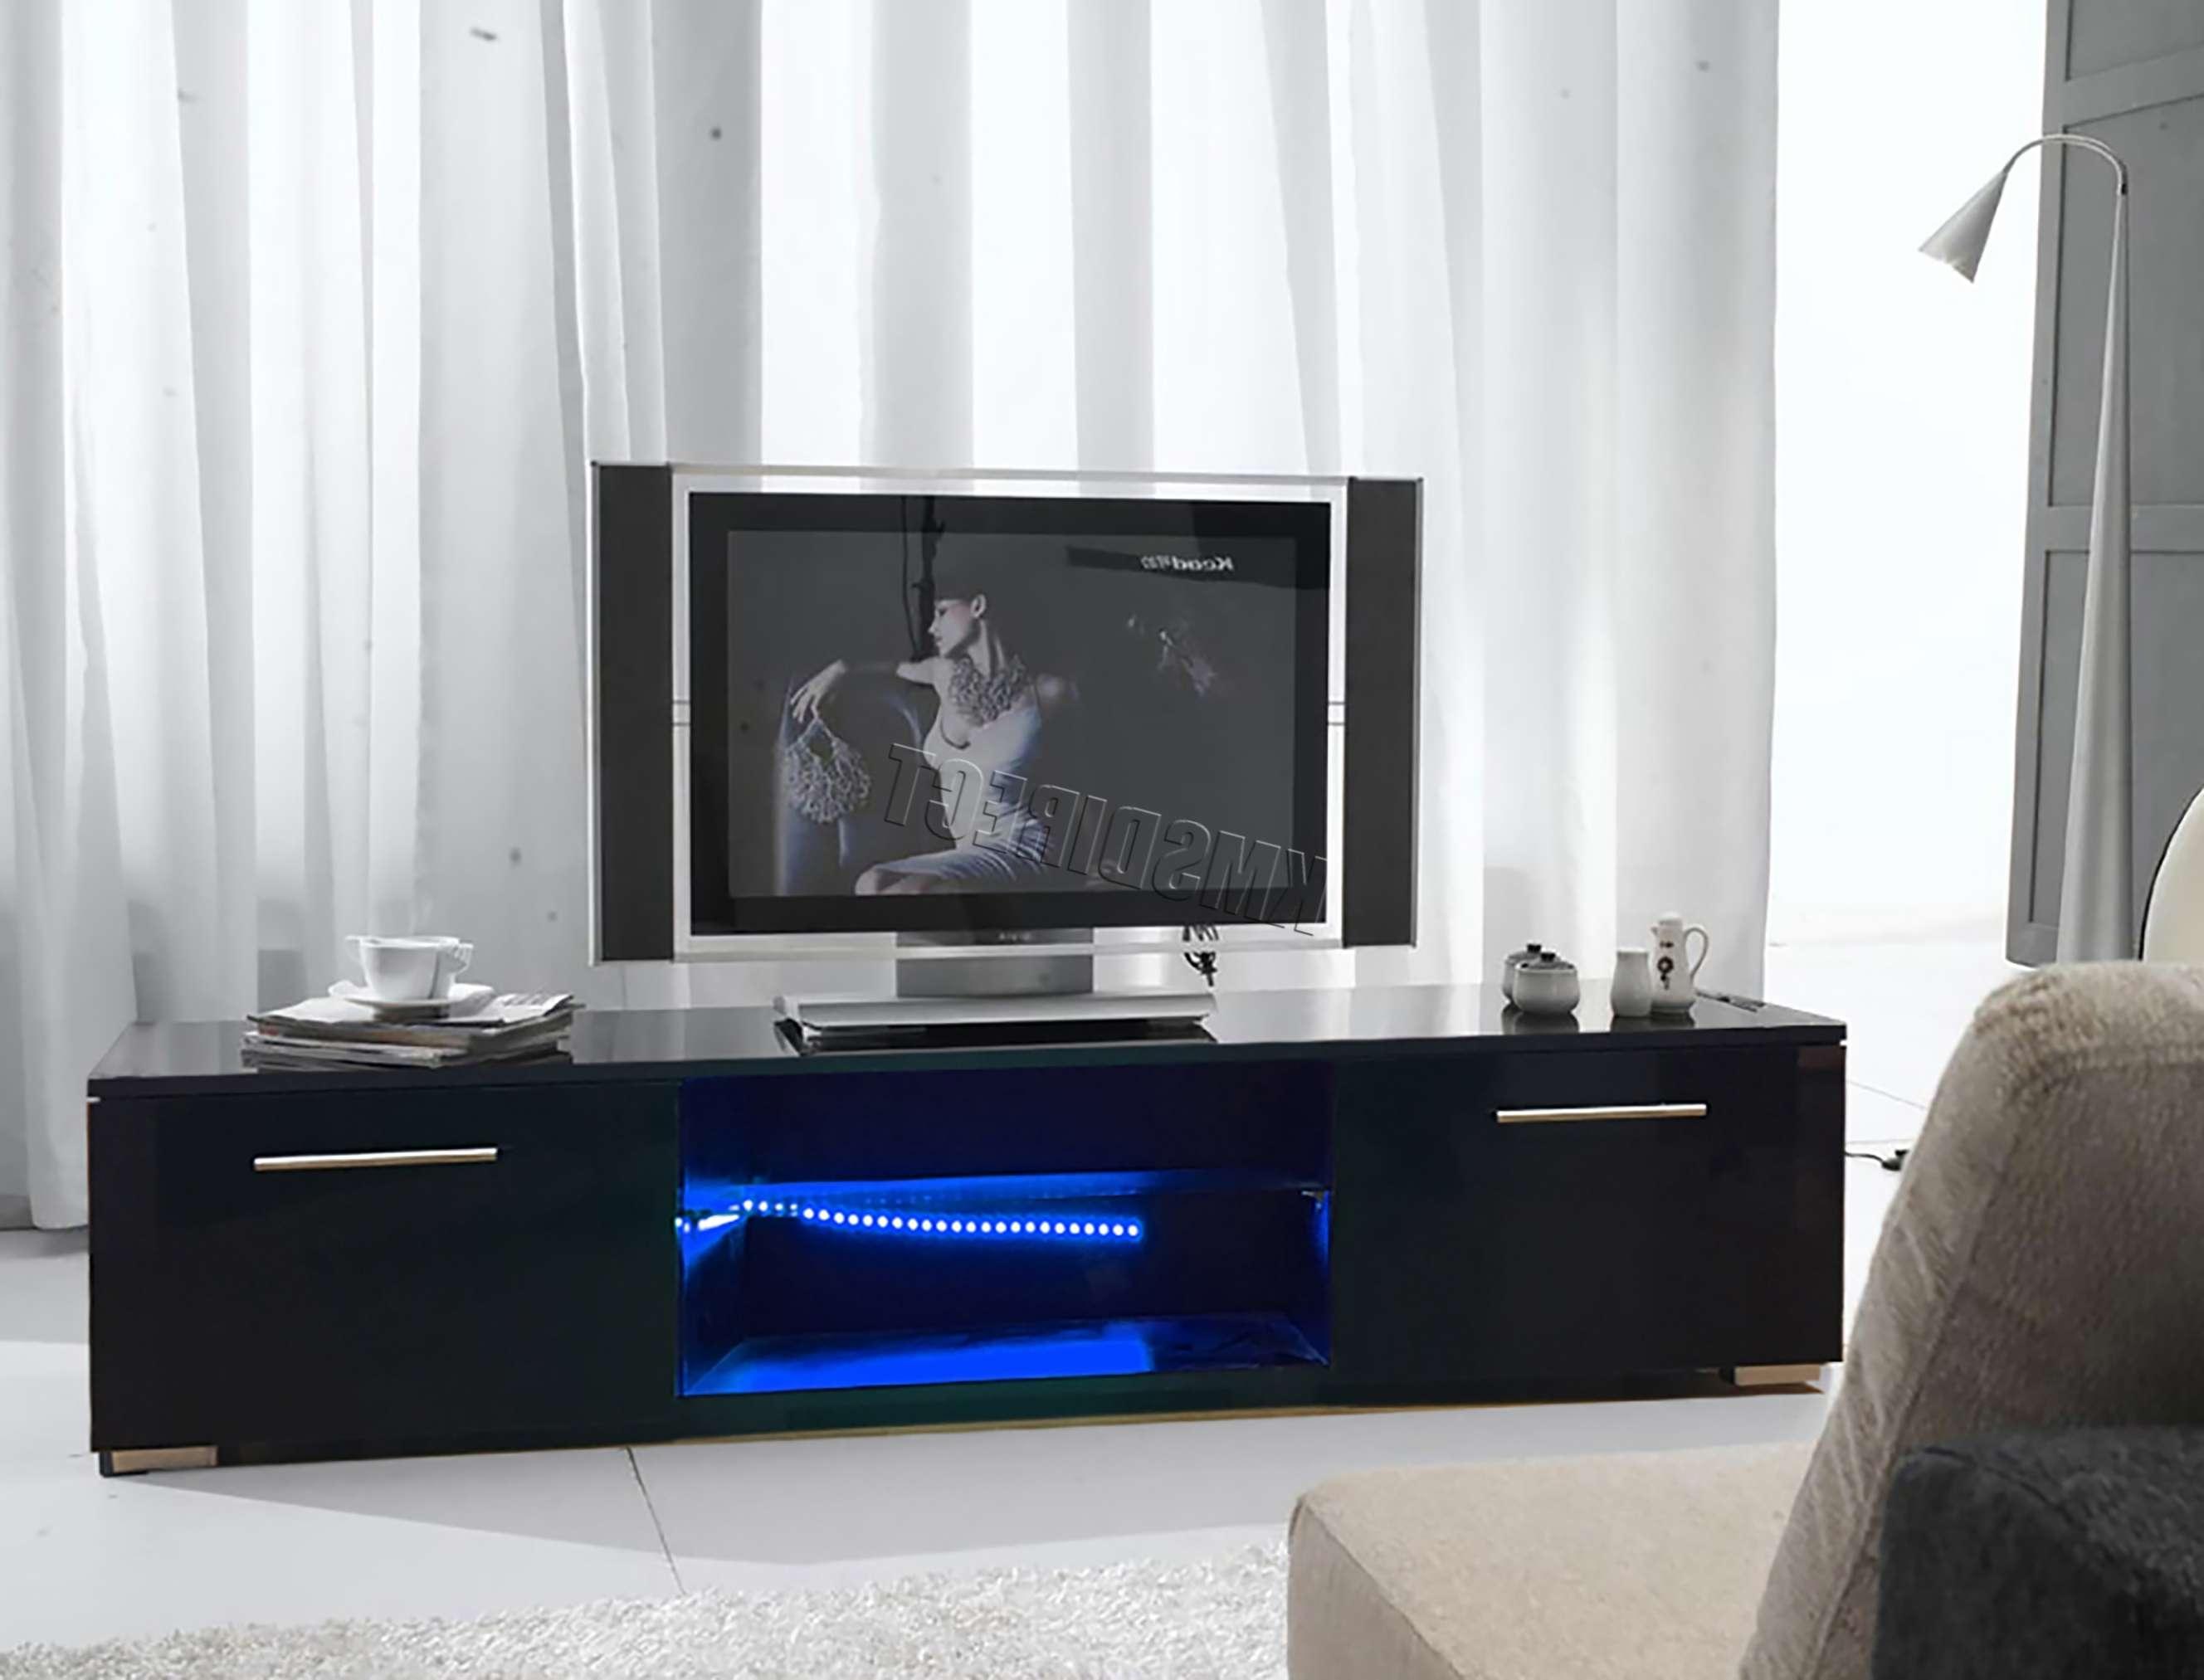 Foxhunter Modern High Gloss Matt Tv Cabinet Unit Stand Black Rgb Within High Gloss Tv Cabinets (View 10 of 20)